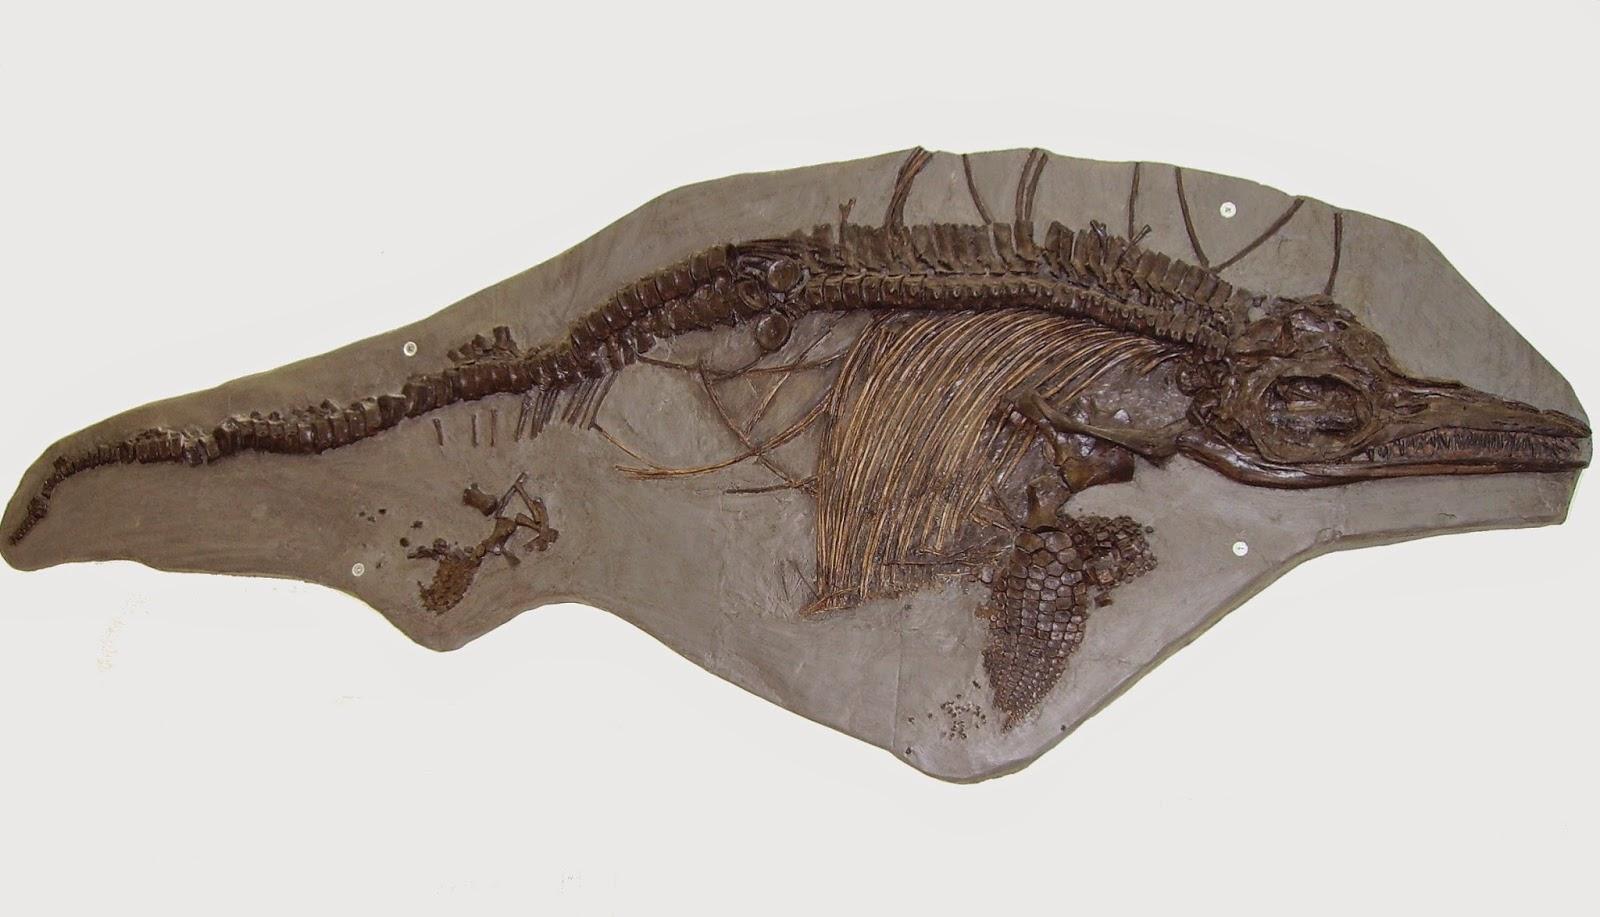 ICHTHYOSAURUS (ITTIOSAURUS) UN ANIMALE ESTINTO NEL GIURASSICO INFERIORE